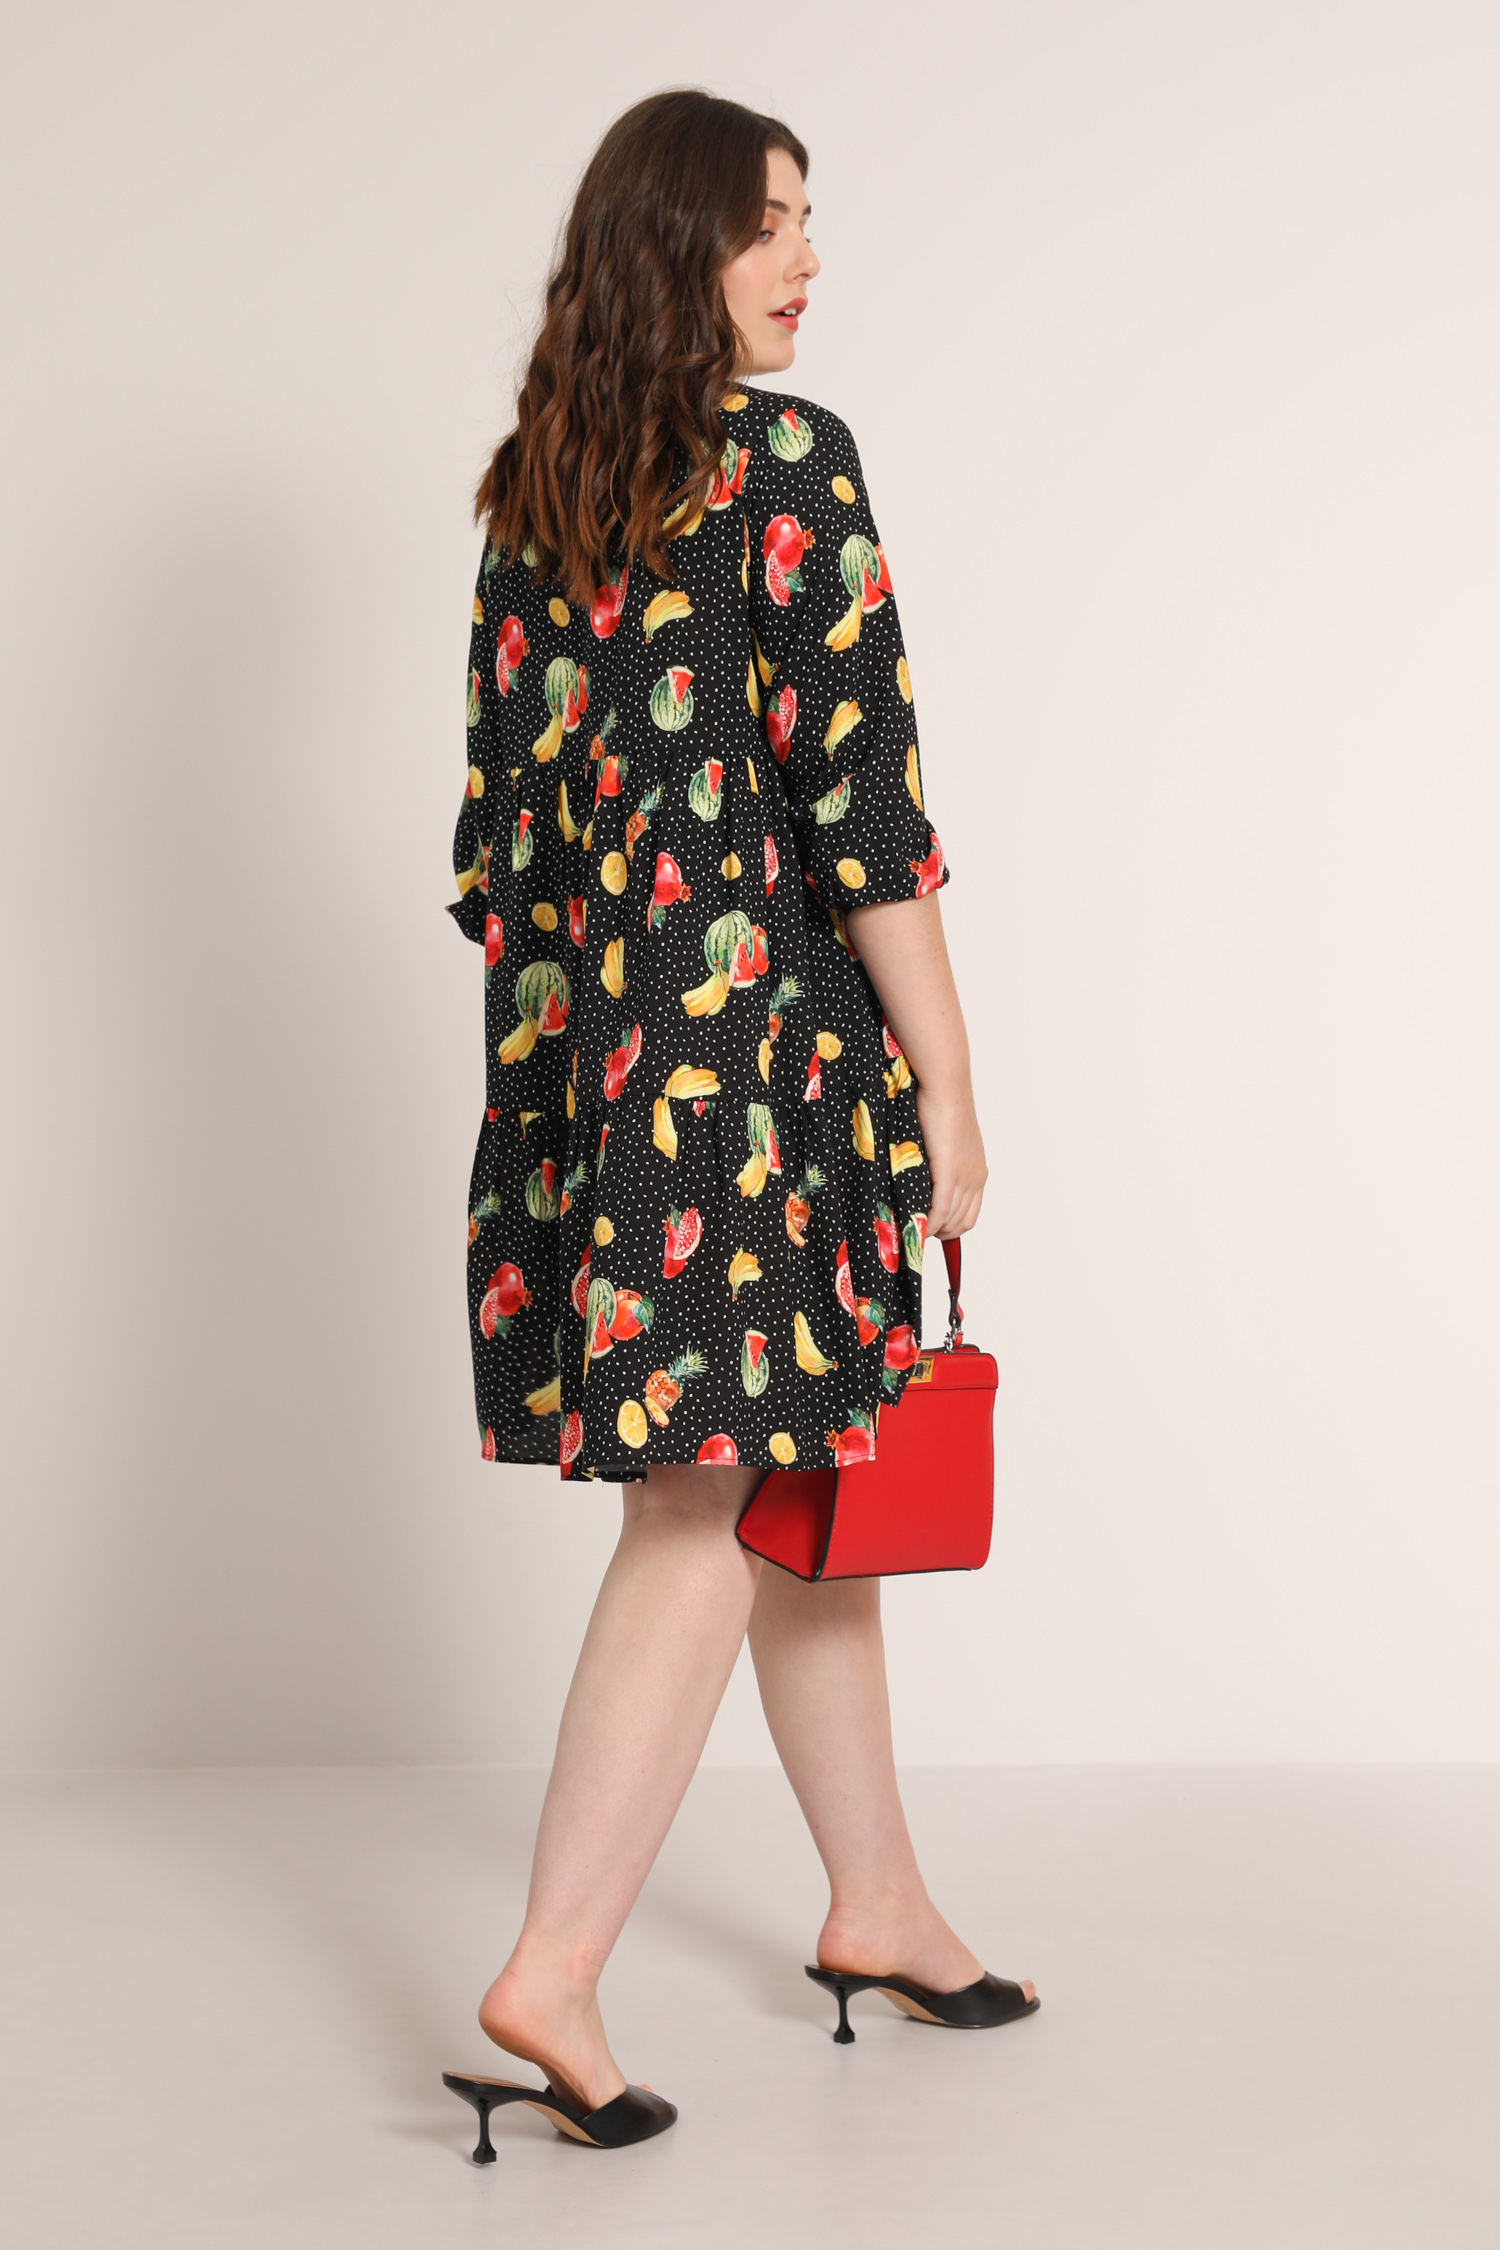 Printed ruffle tunic / dress